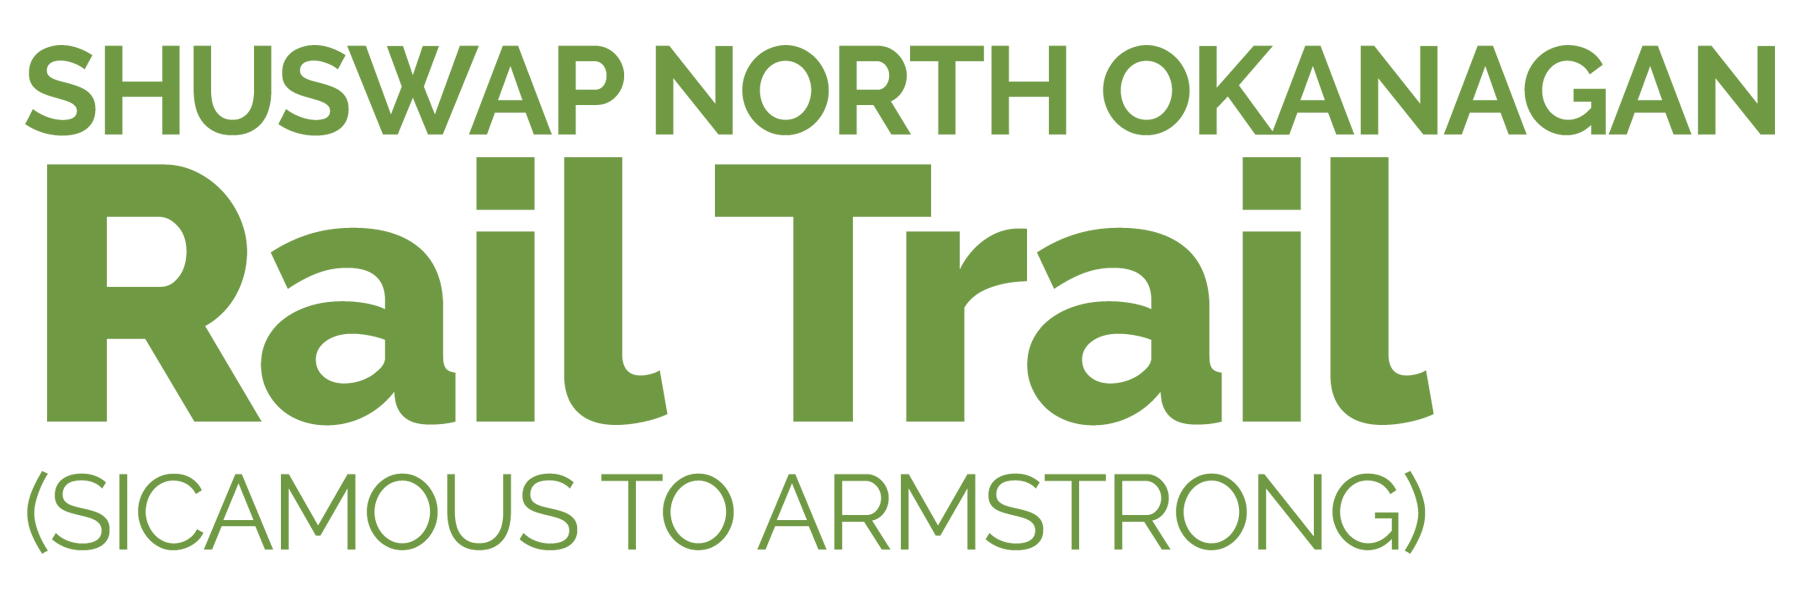 Shuswap North Okanagan Rail Trail (Sicamous to Armstrong)